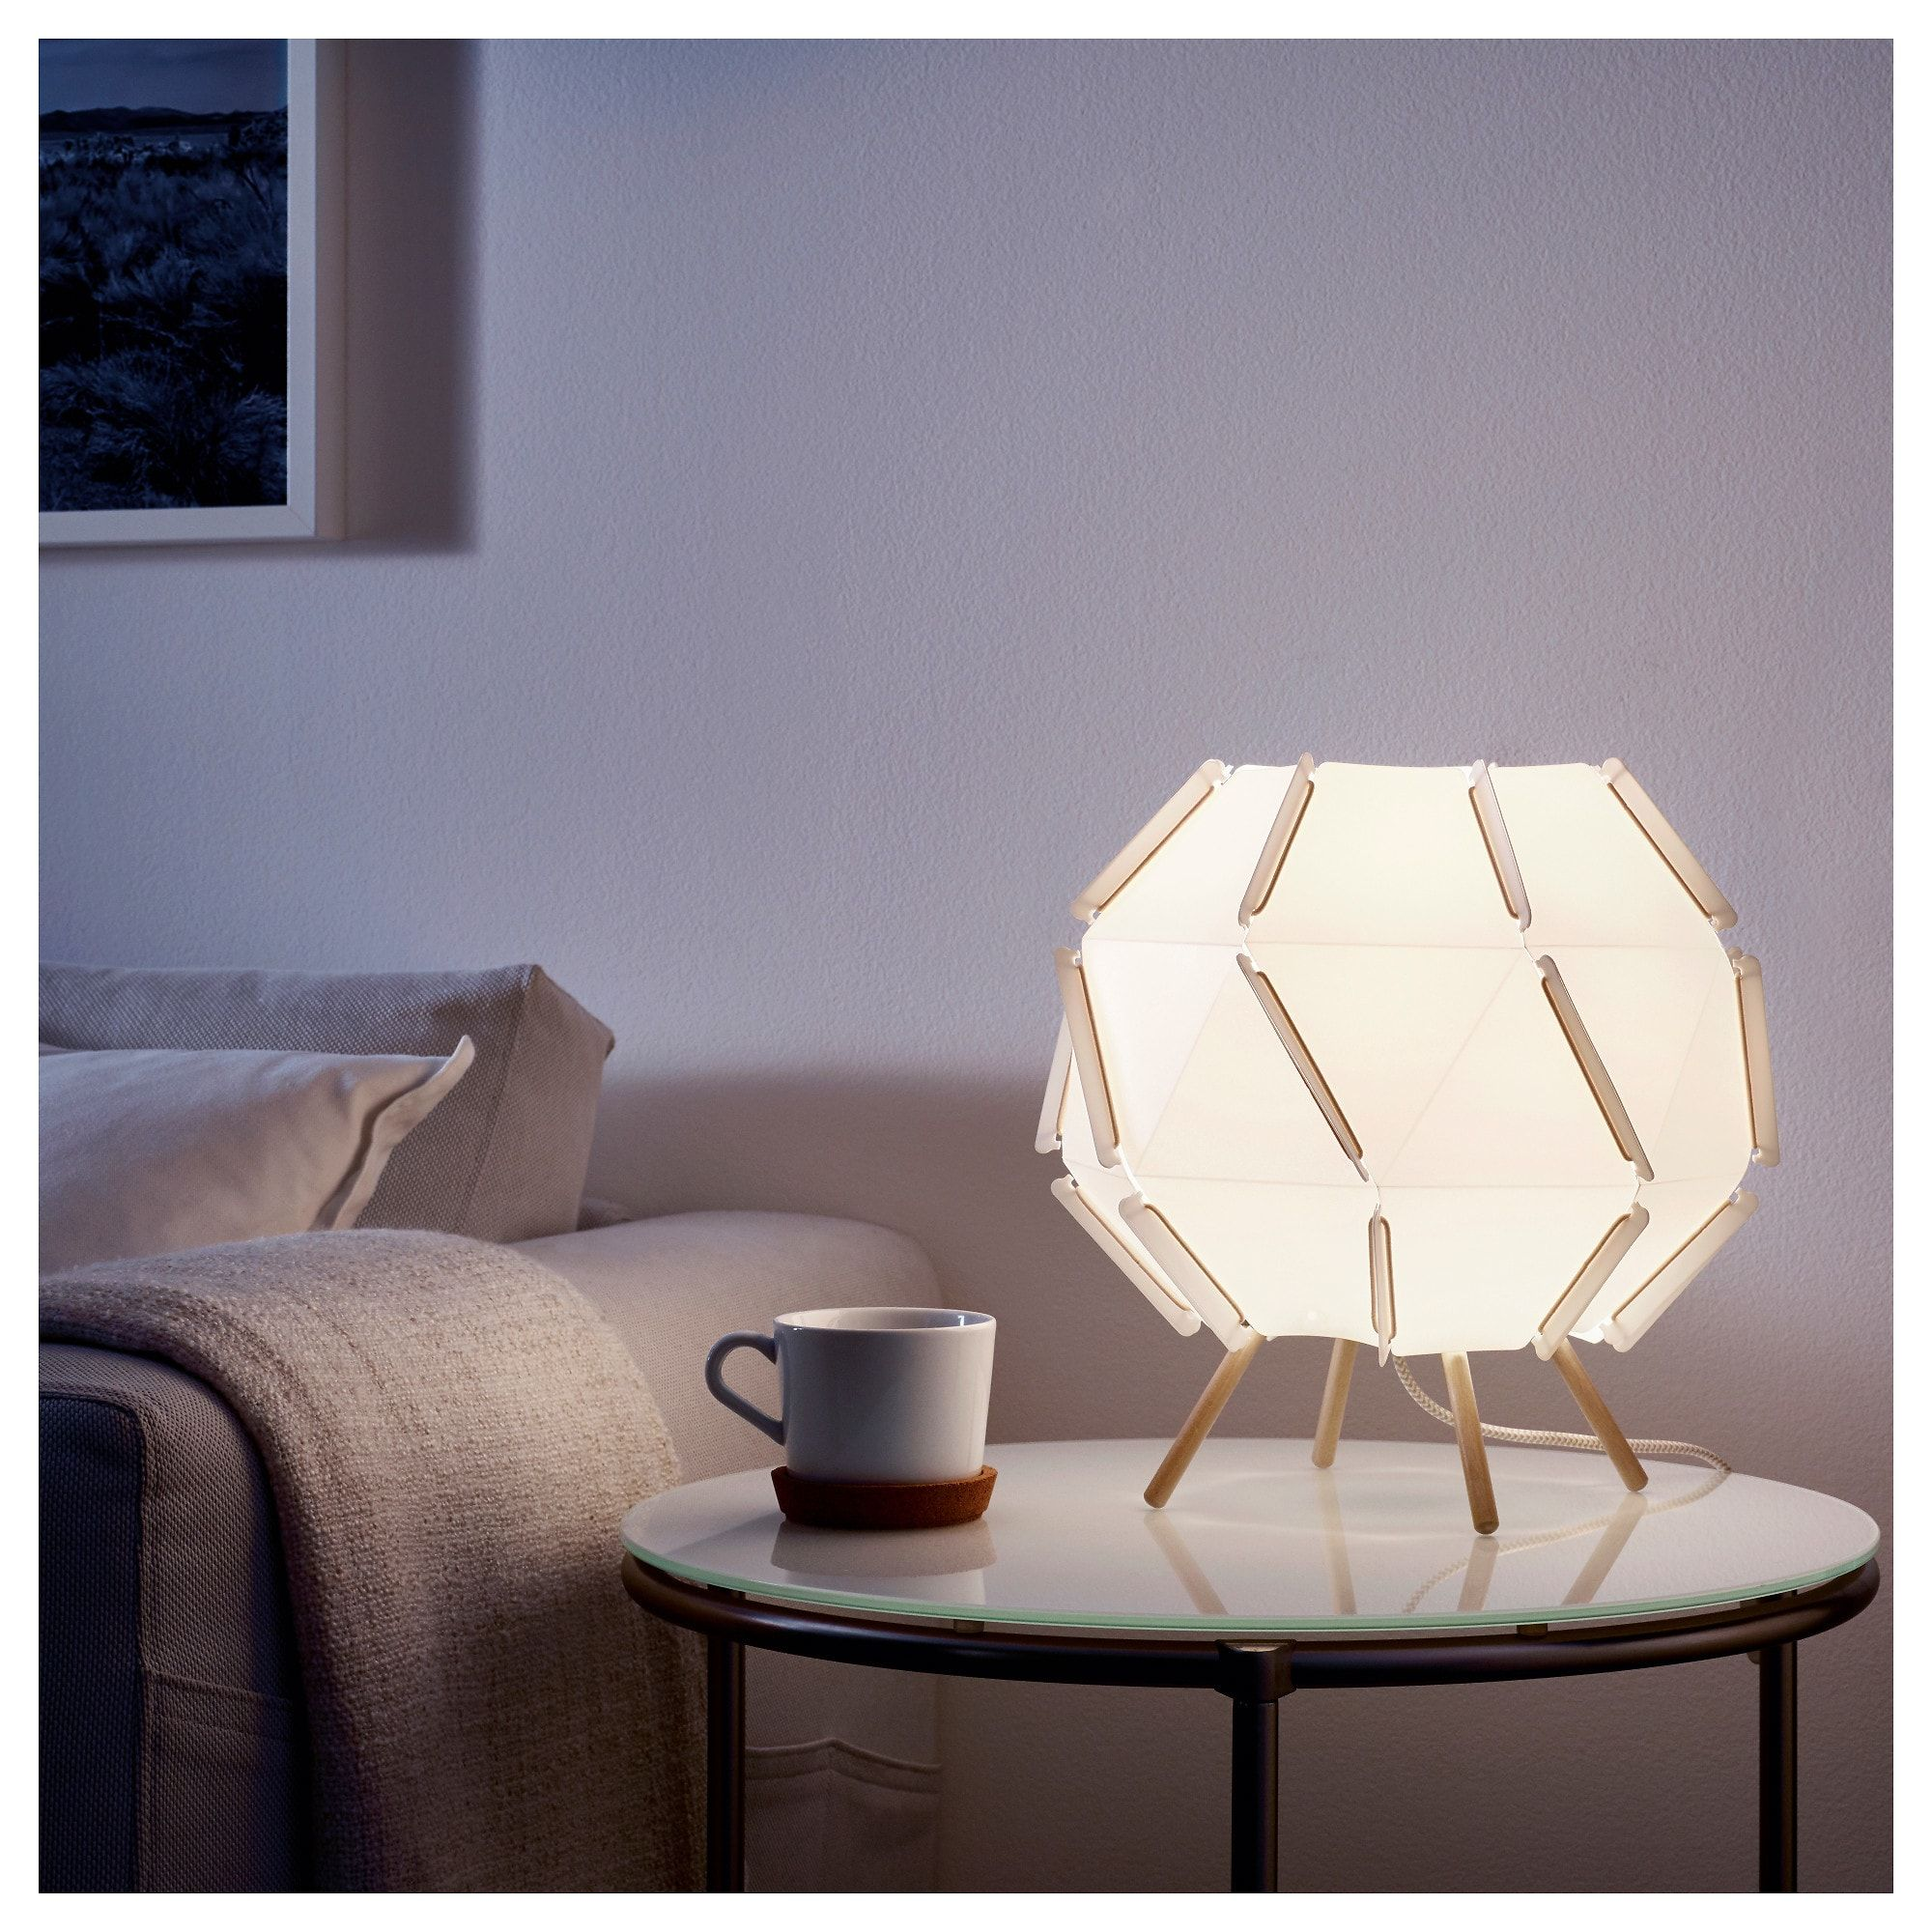 Ikea Us Furniture And Home Furnishings Lampe De Table Blanche Lampes De Table Table Blanche